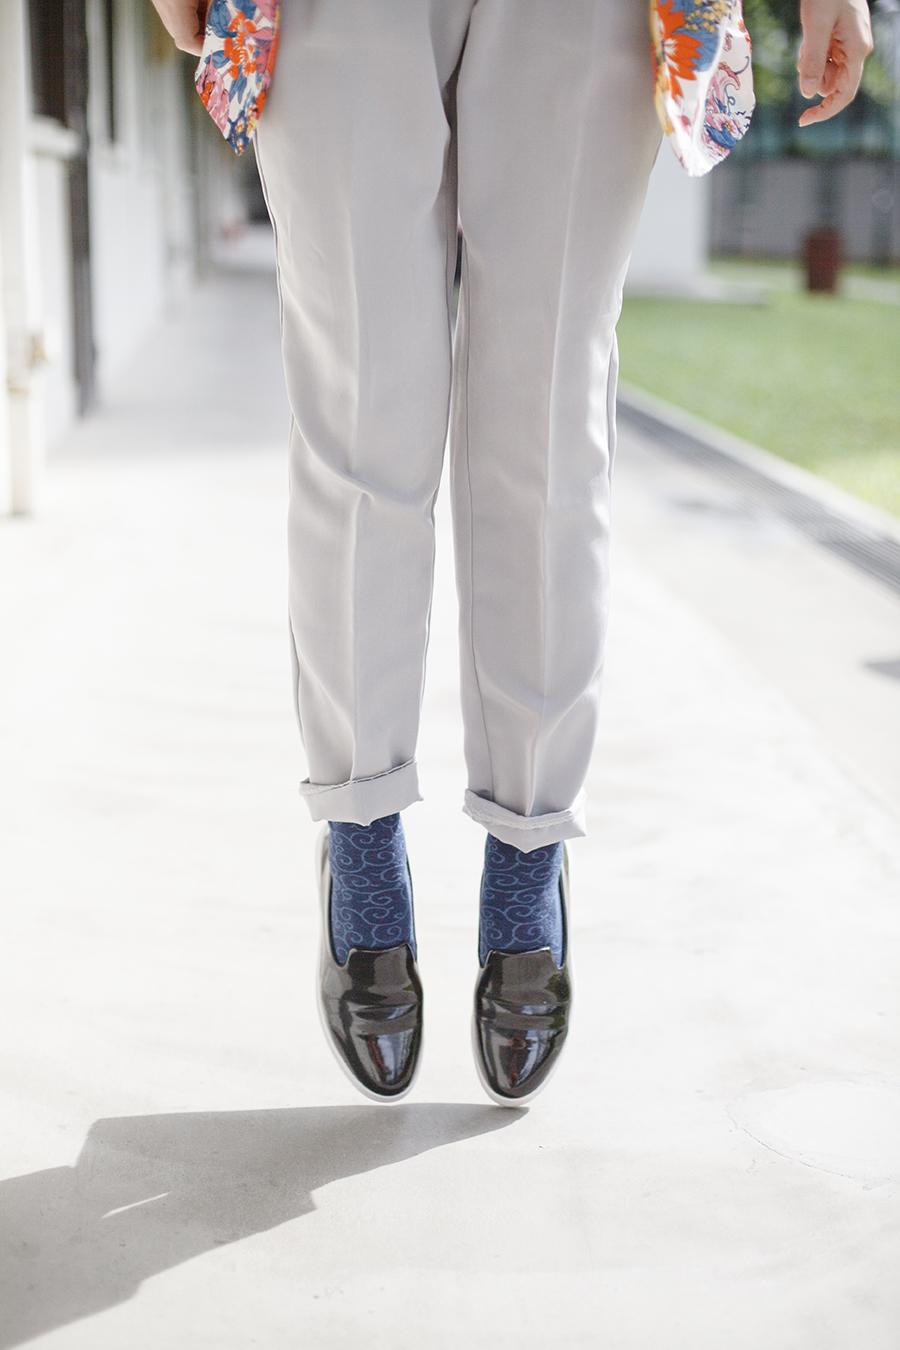 American Apparel grey trousers, Trunks-ya blue tabi socks, Zalora black slip-ons.